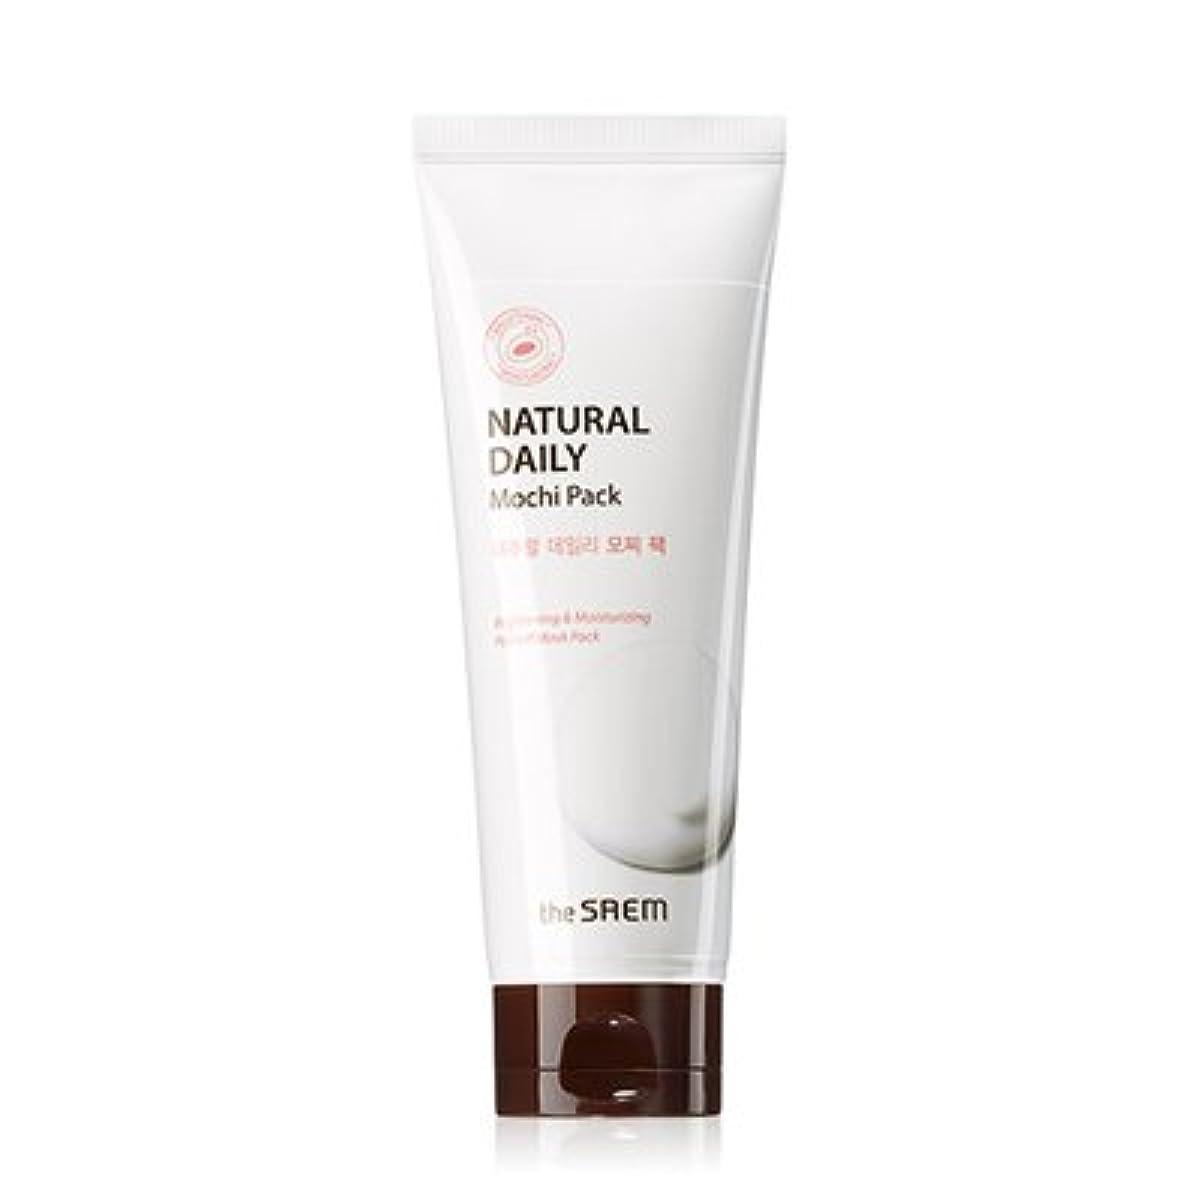 THE SAEM Natural Daily Mochi Pack 120g / ザセム ナチュラルデイリーモチーフパック [NEW] [並行輸入品]